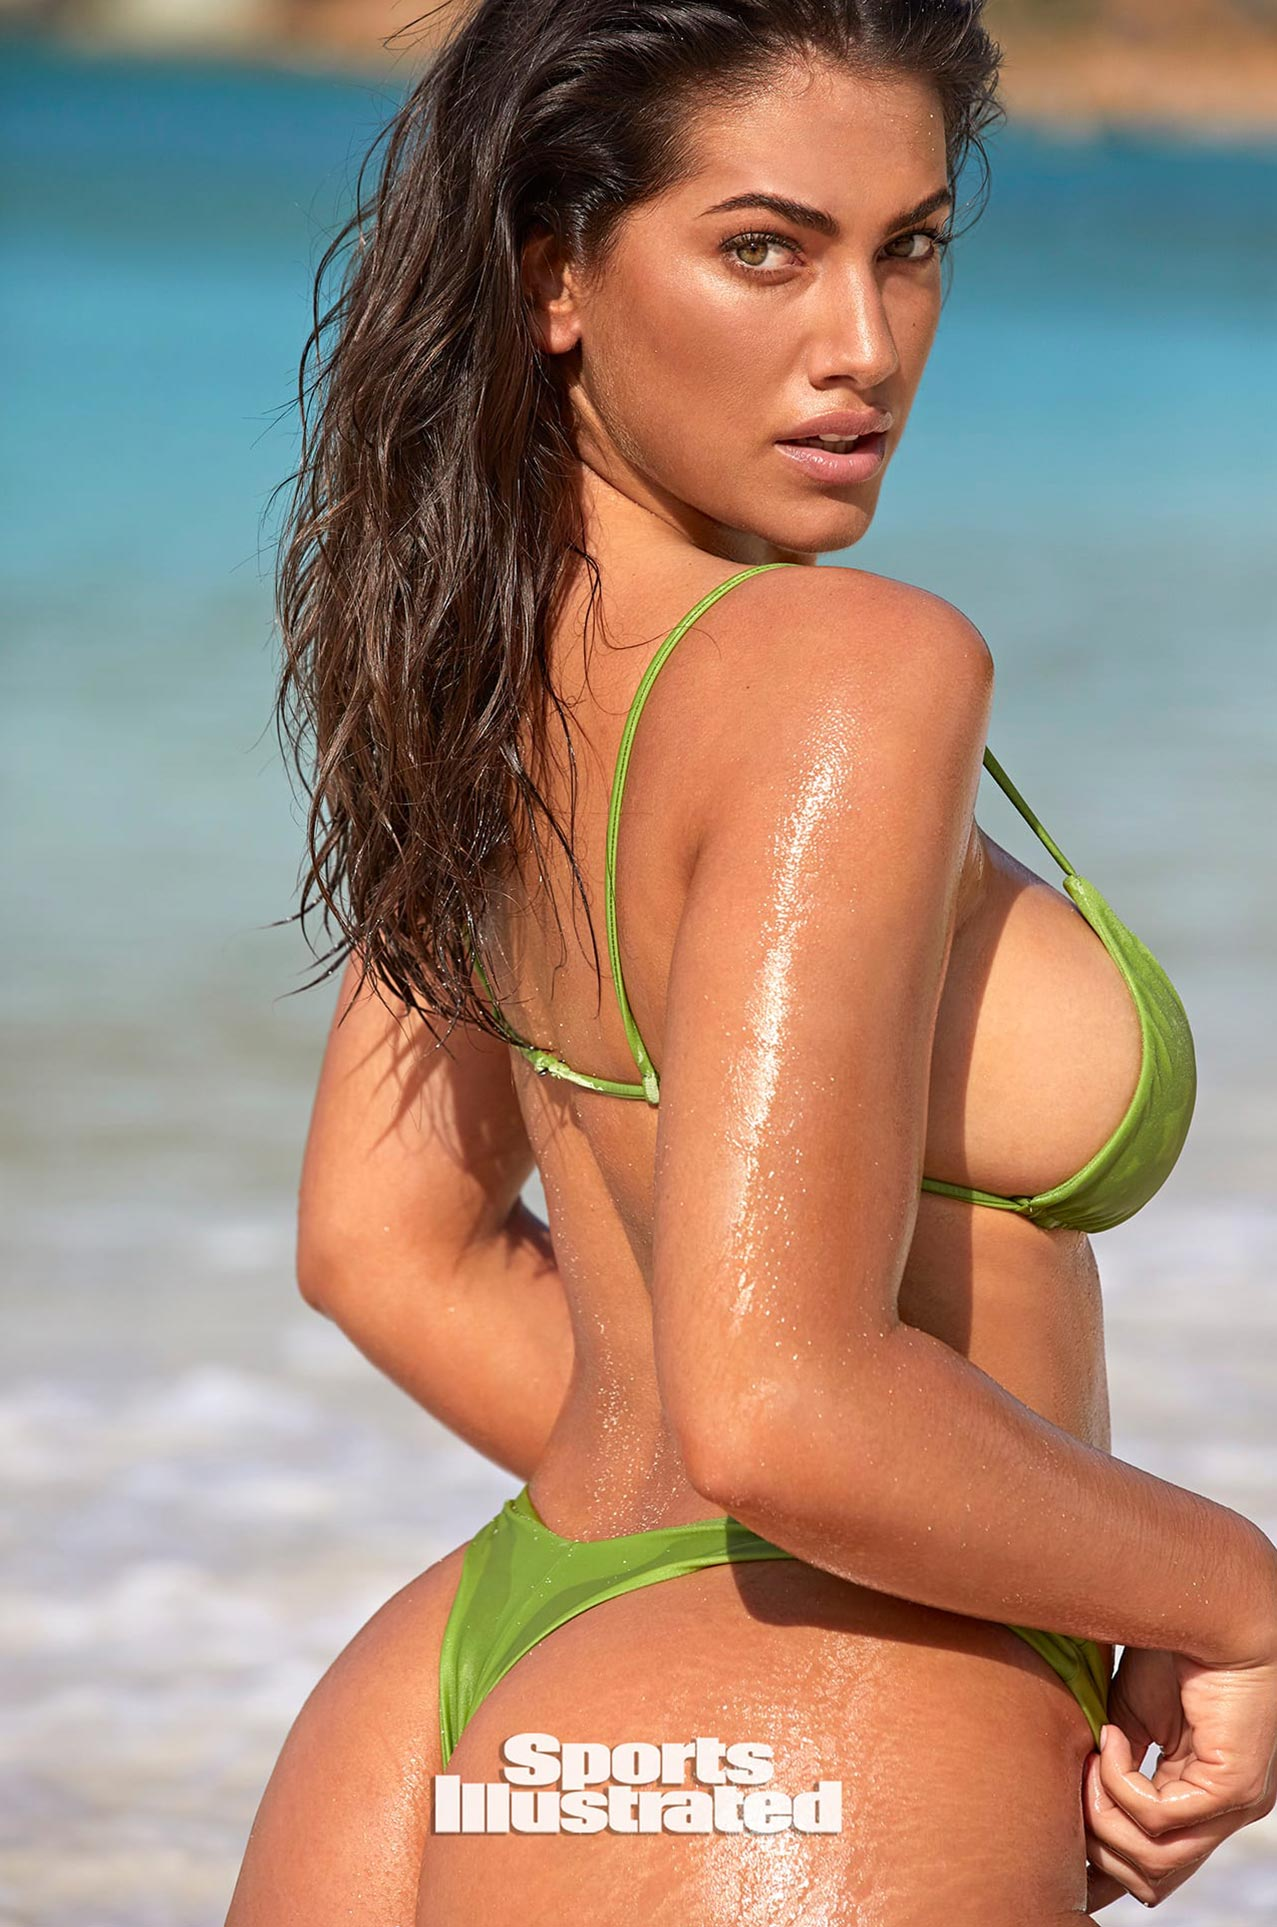 Лорена Дюран в каталоге купальников Sports Illustrated Swimsuit 2020 / фото 04